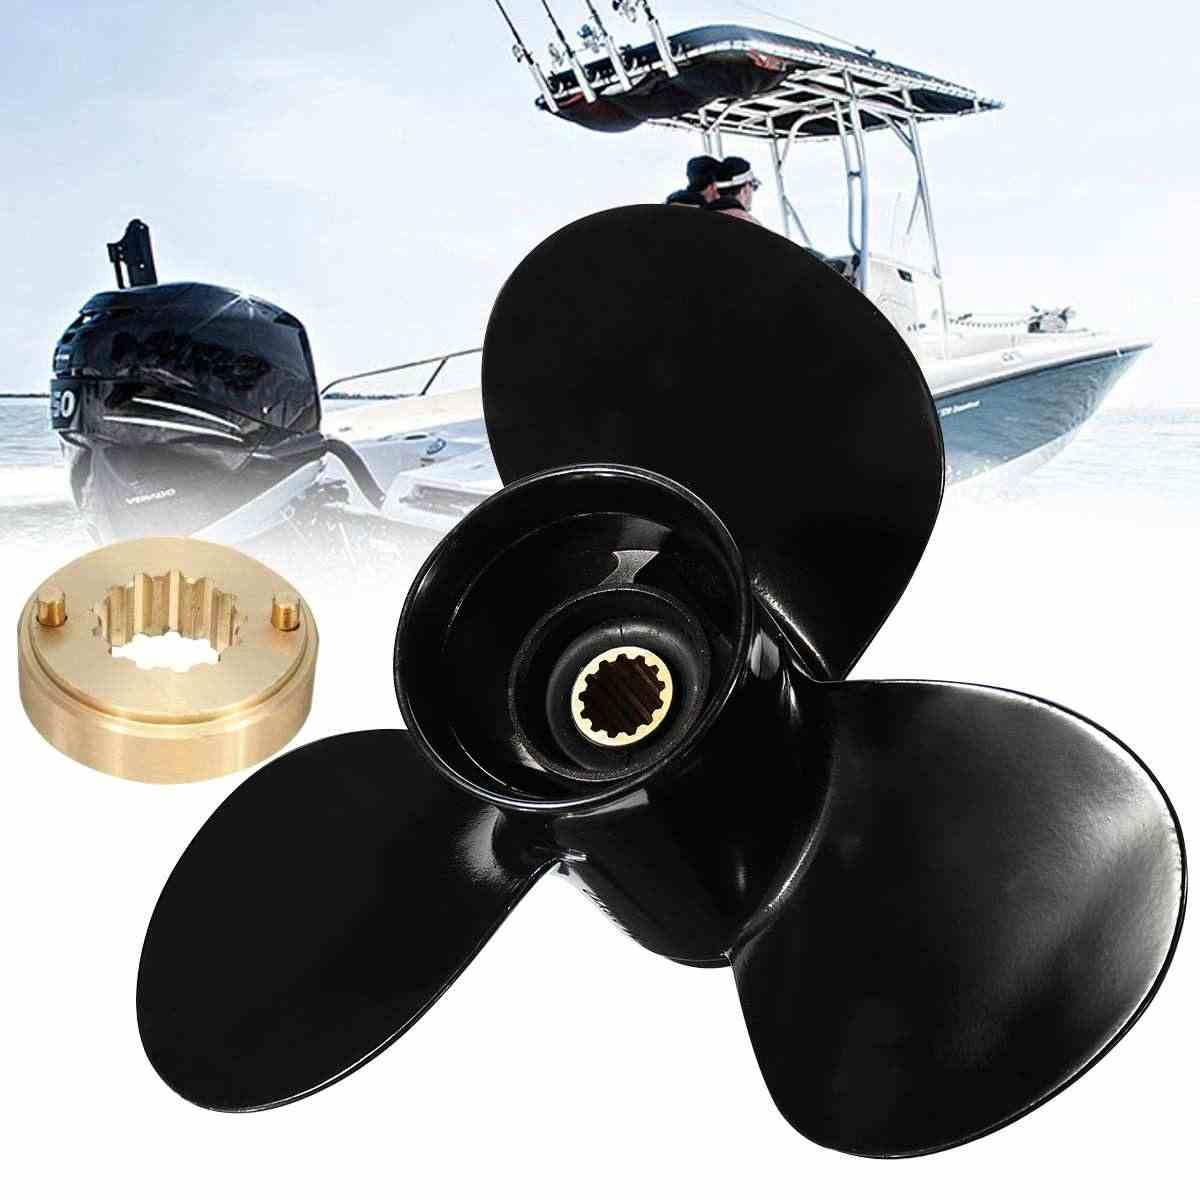 10 1/4x10 K Boat Engine Aluminum Alloy Propeller for Suzuki Johnson